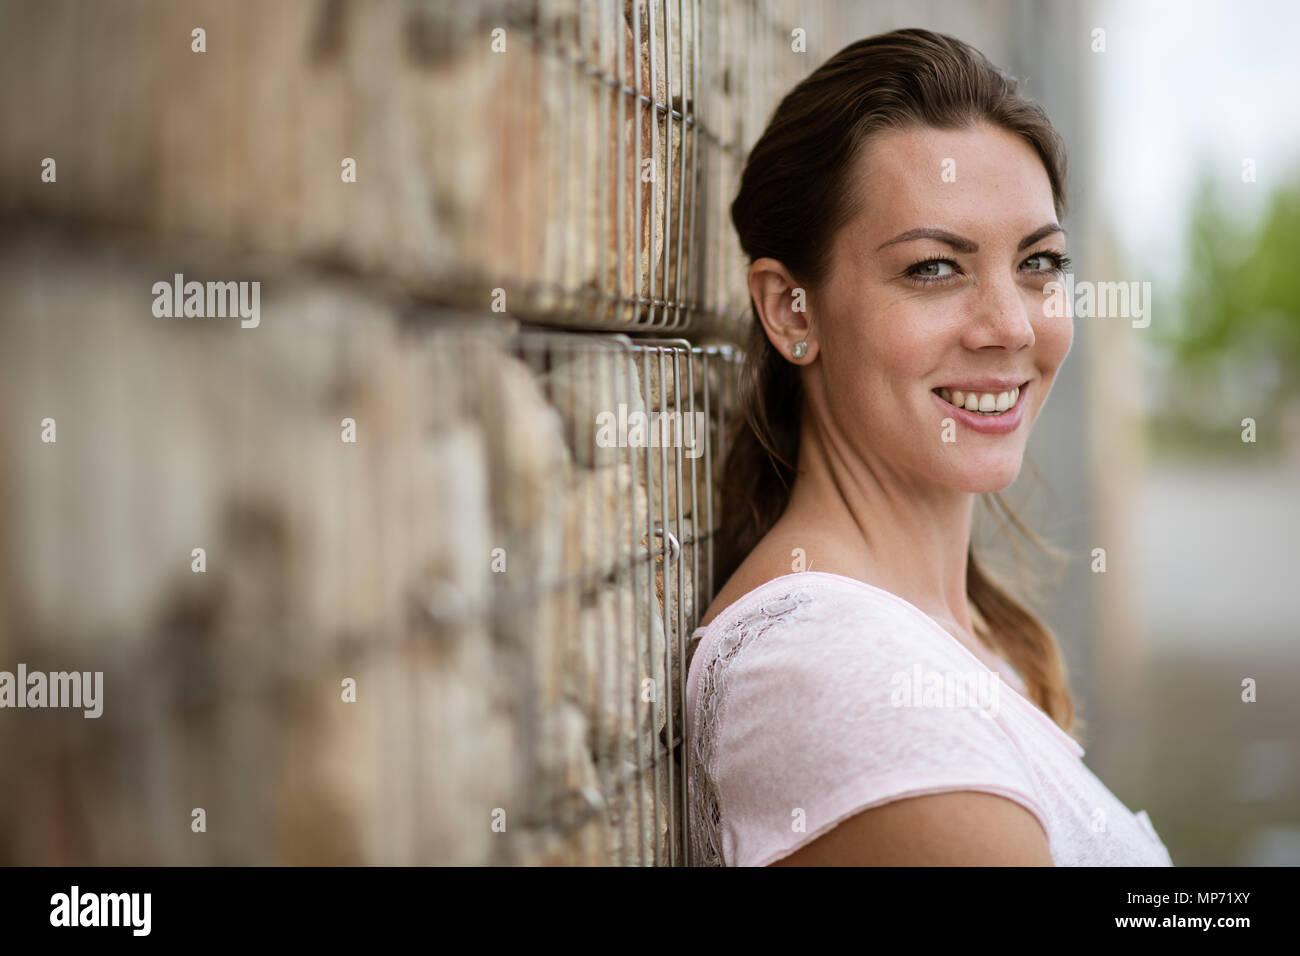 11 May 2018, Germany, Leverkusen: Pole-jumper Katharina Bauer of TSV Bayer 04 Leverkusen. Photo: Marius Becker/dpa - Stock Image